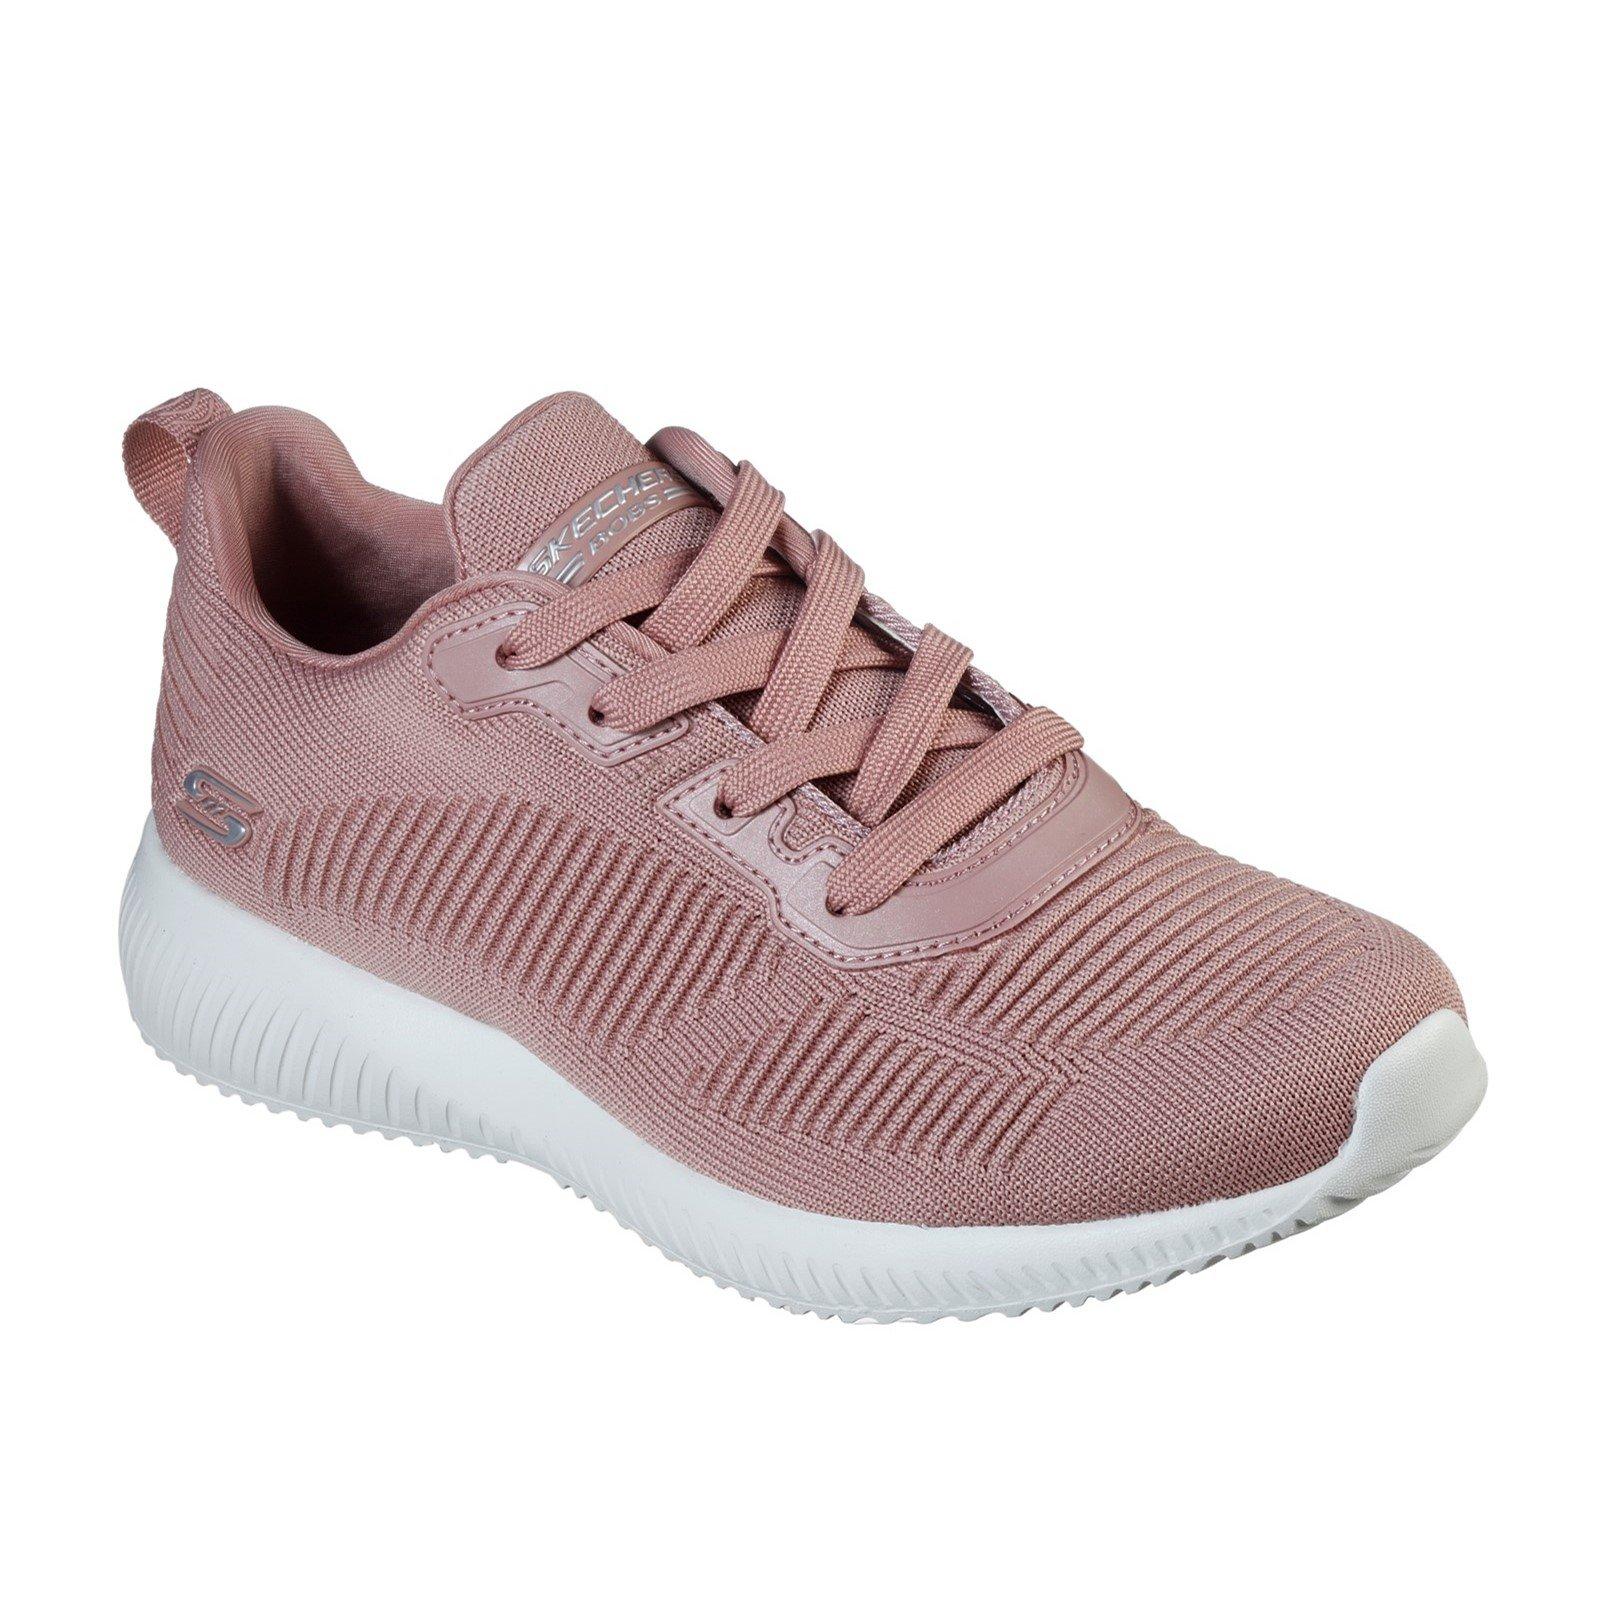 Skechers Women's Bobs Squad Tough Talk Wide Trainer Various Colours 33062 - Pink 6